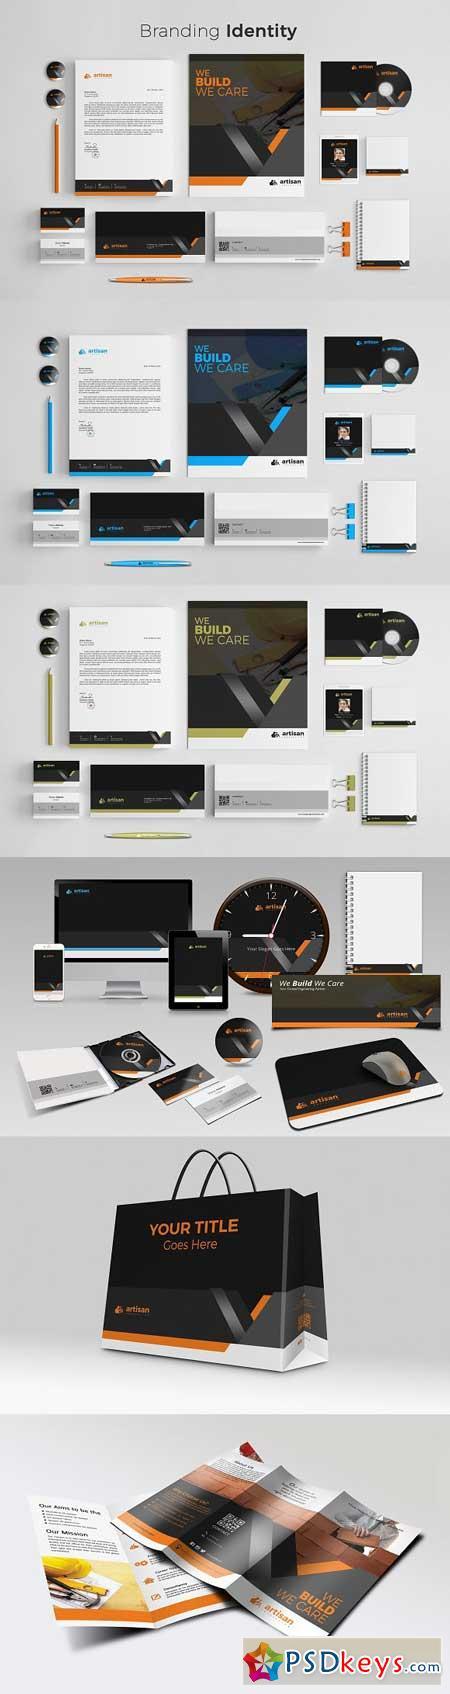 Branding Identity 3242700